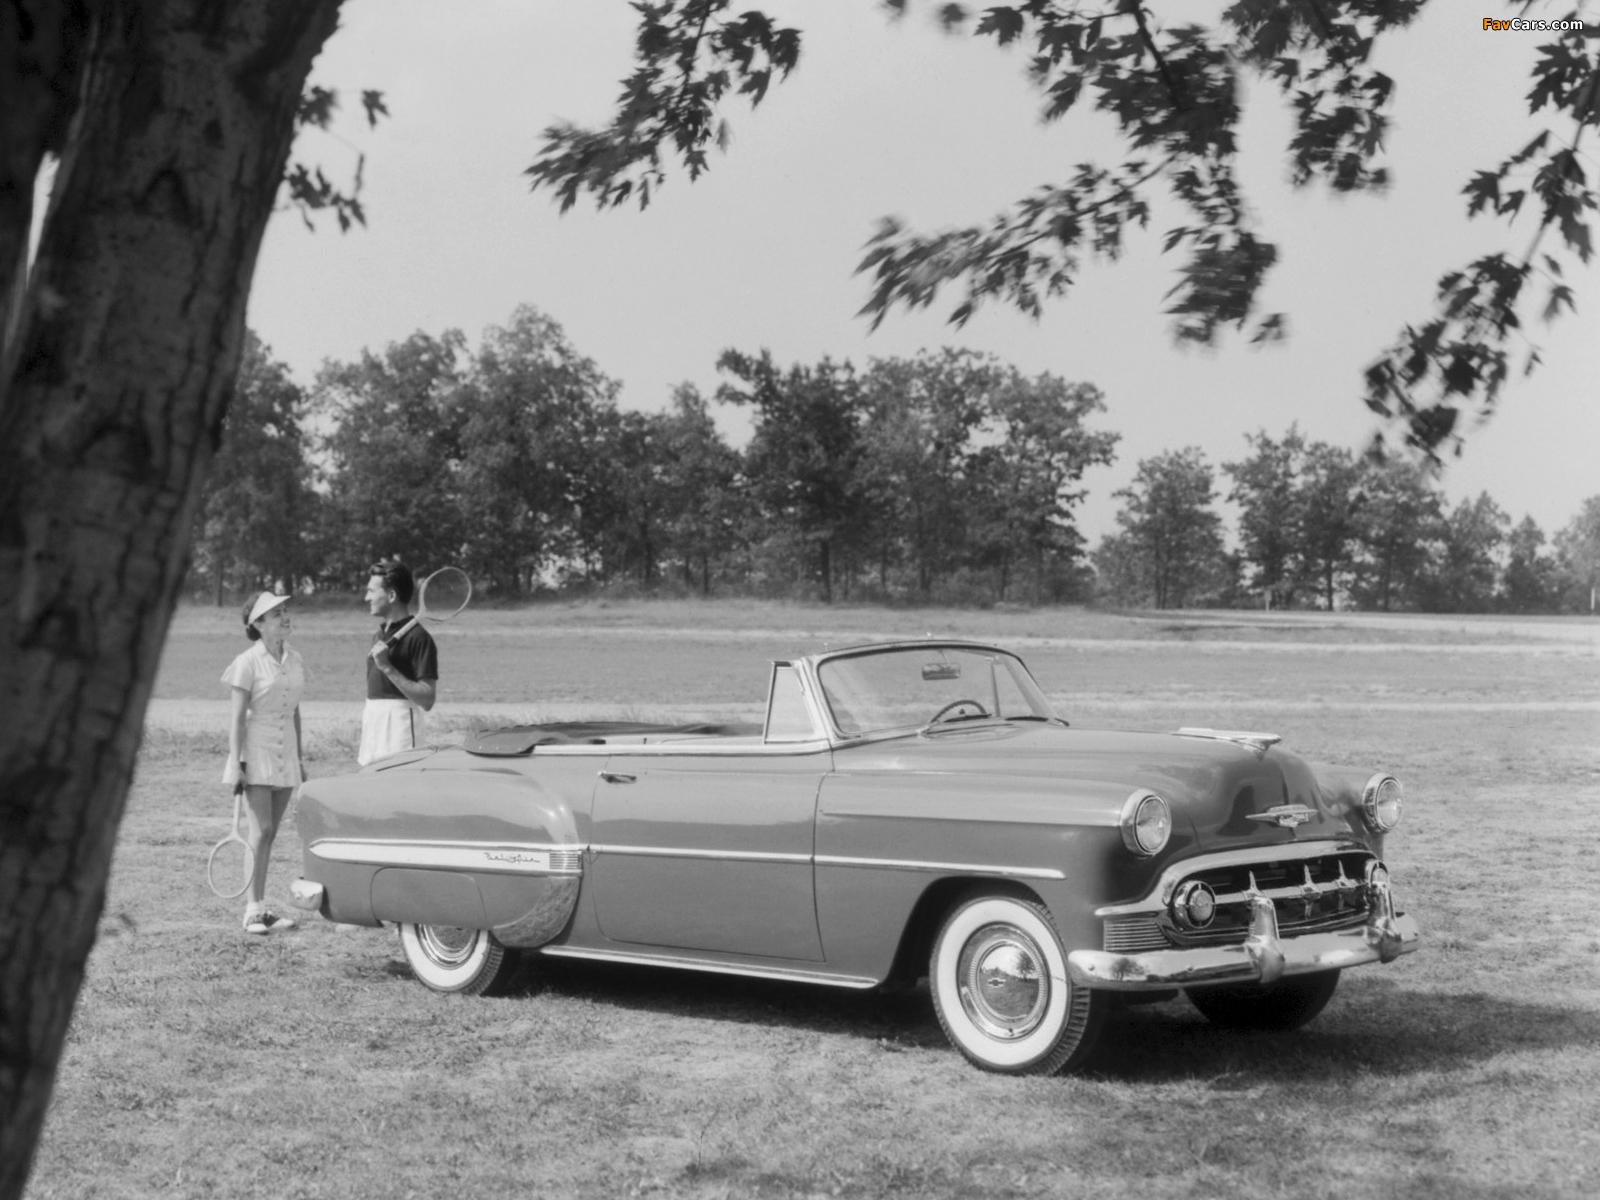 Chevrolet Bel Air Convertible 2434 1067d 1953 Photos